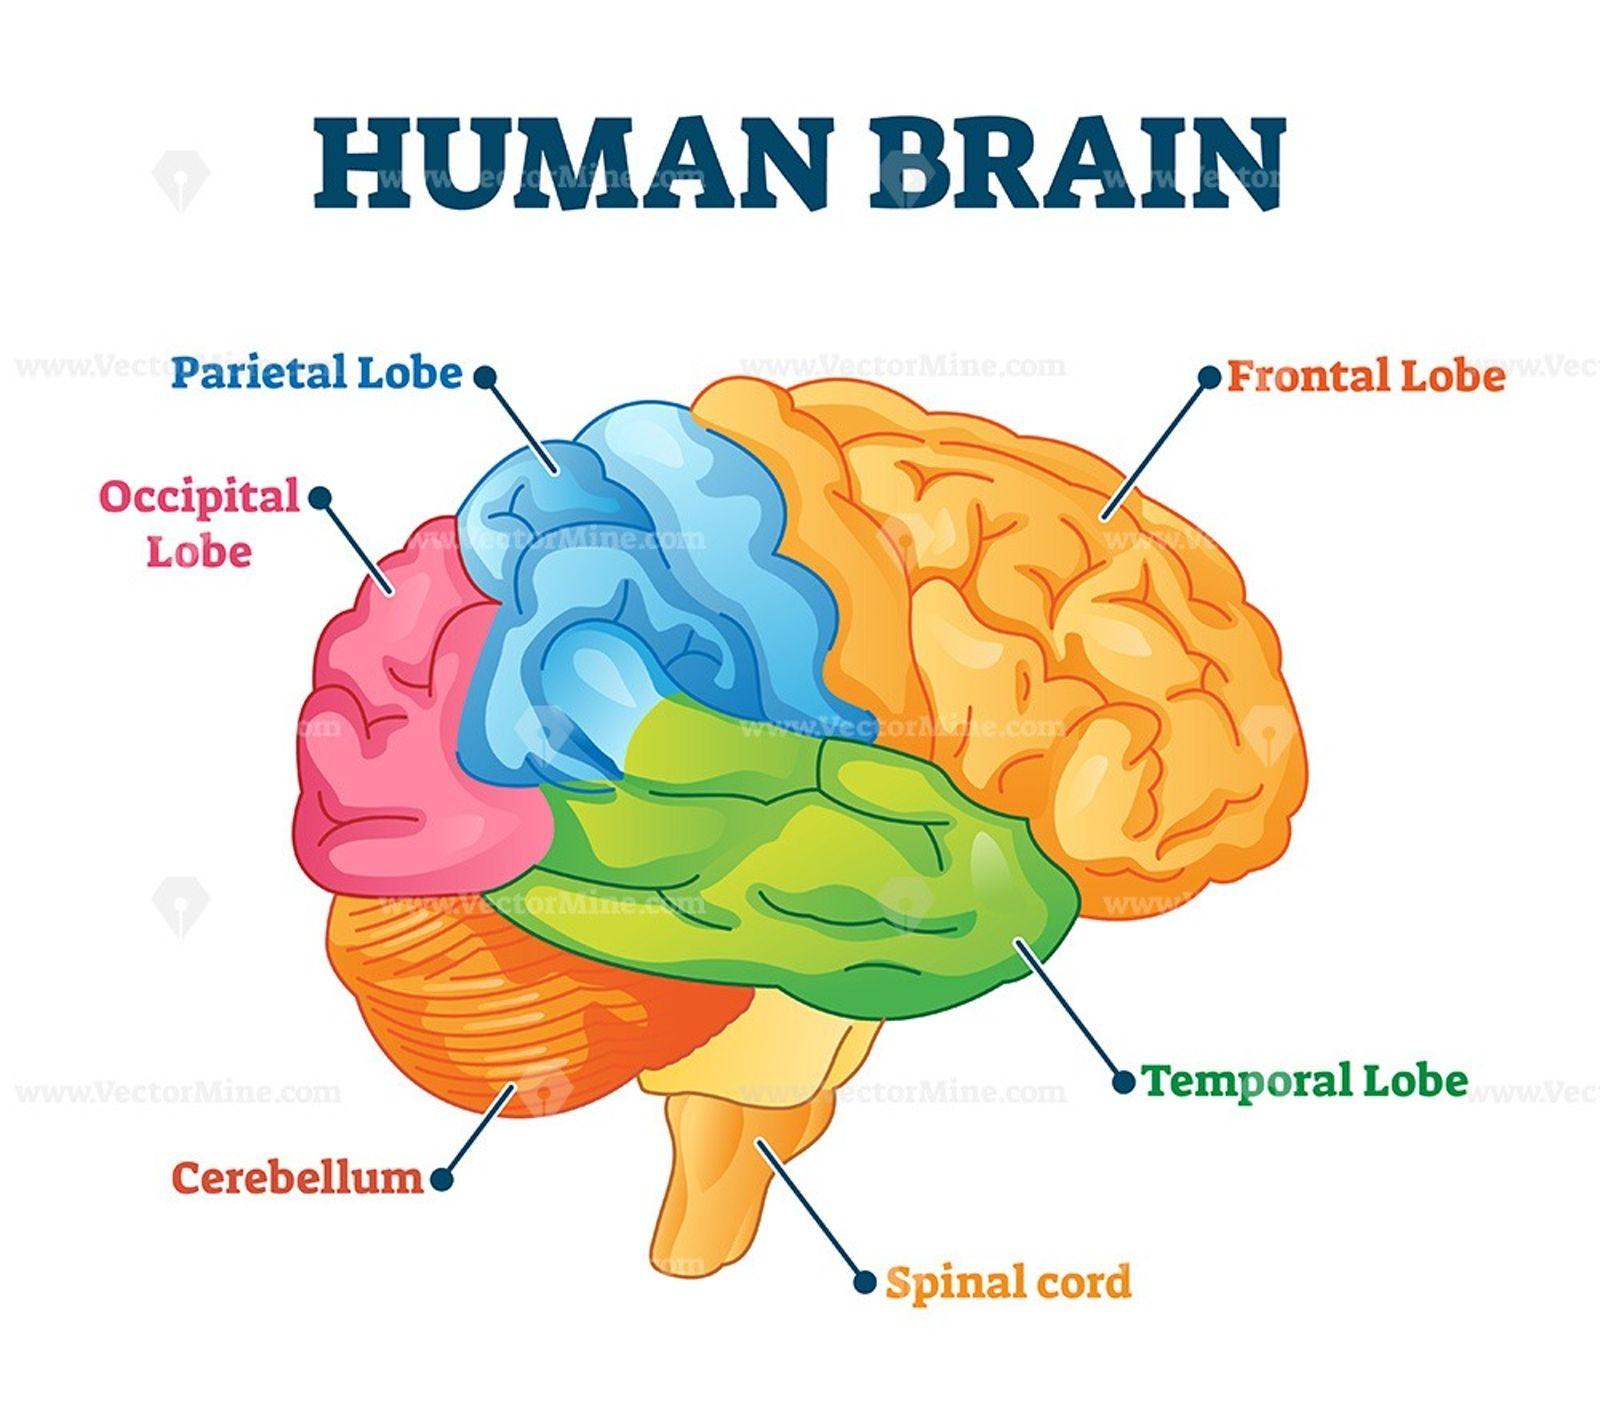 Human brain vector illustration | Human brain, Brain ...